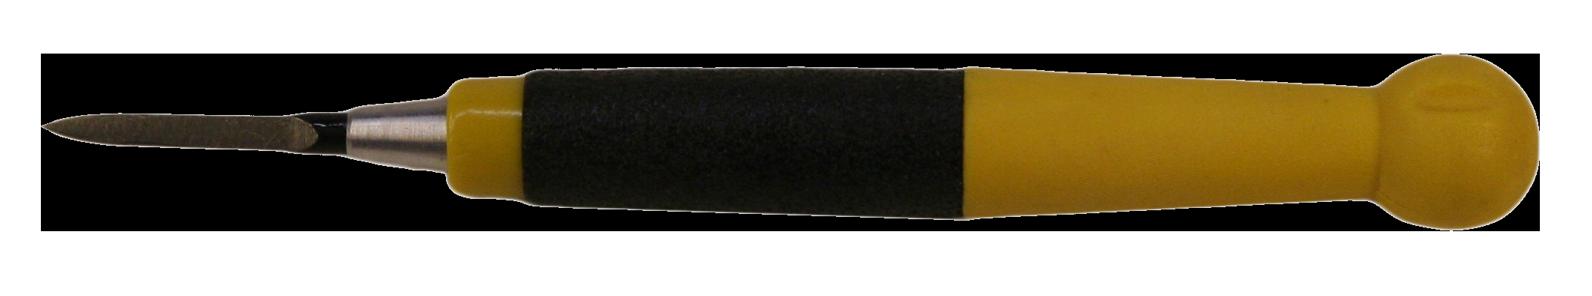 Micro MK C     Image